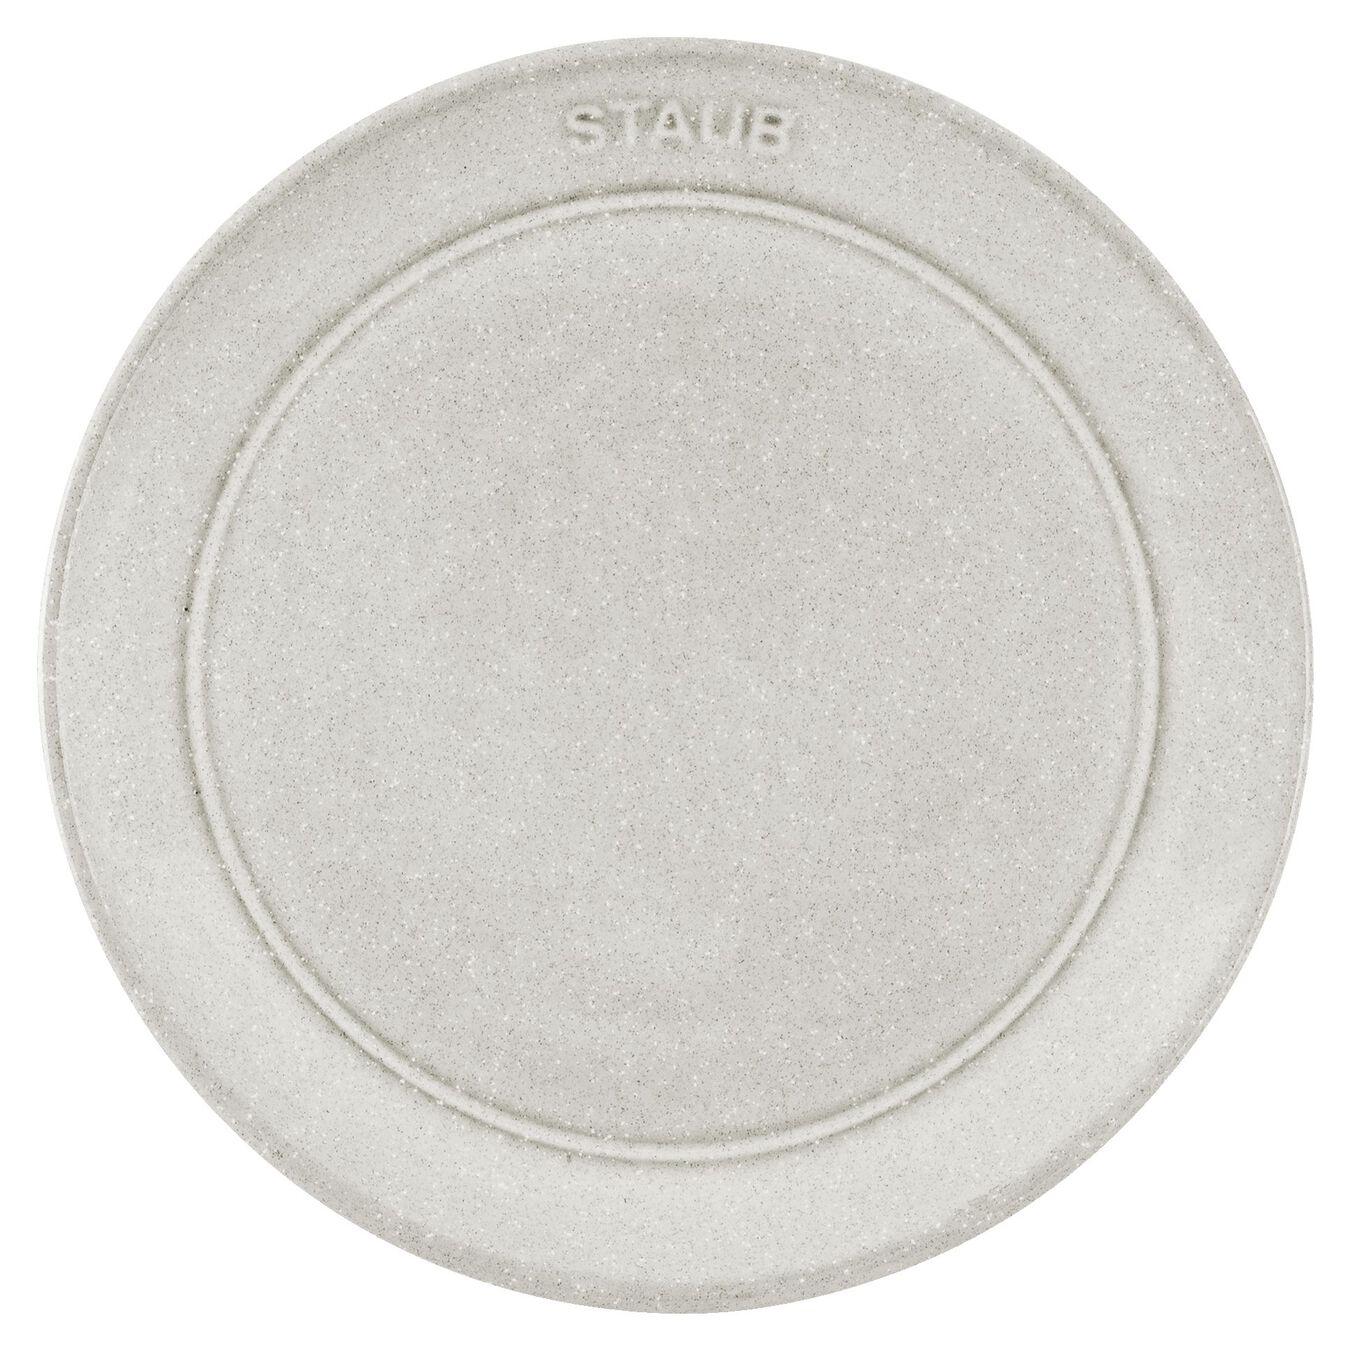 15 cm Ceramic round Assiette flat, White Truffle,,large 2